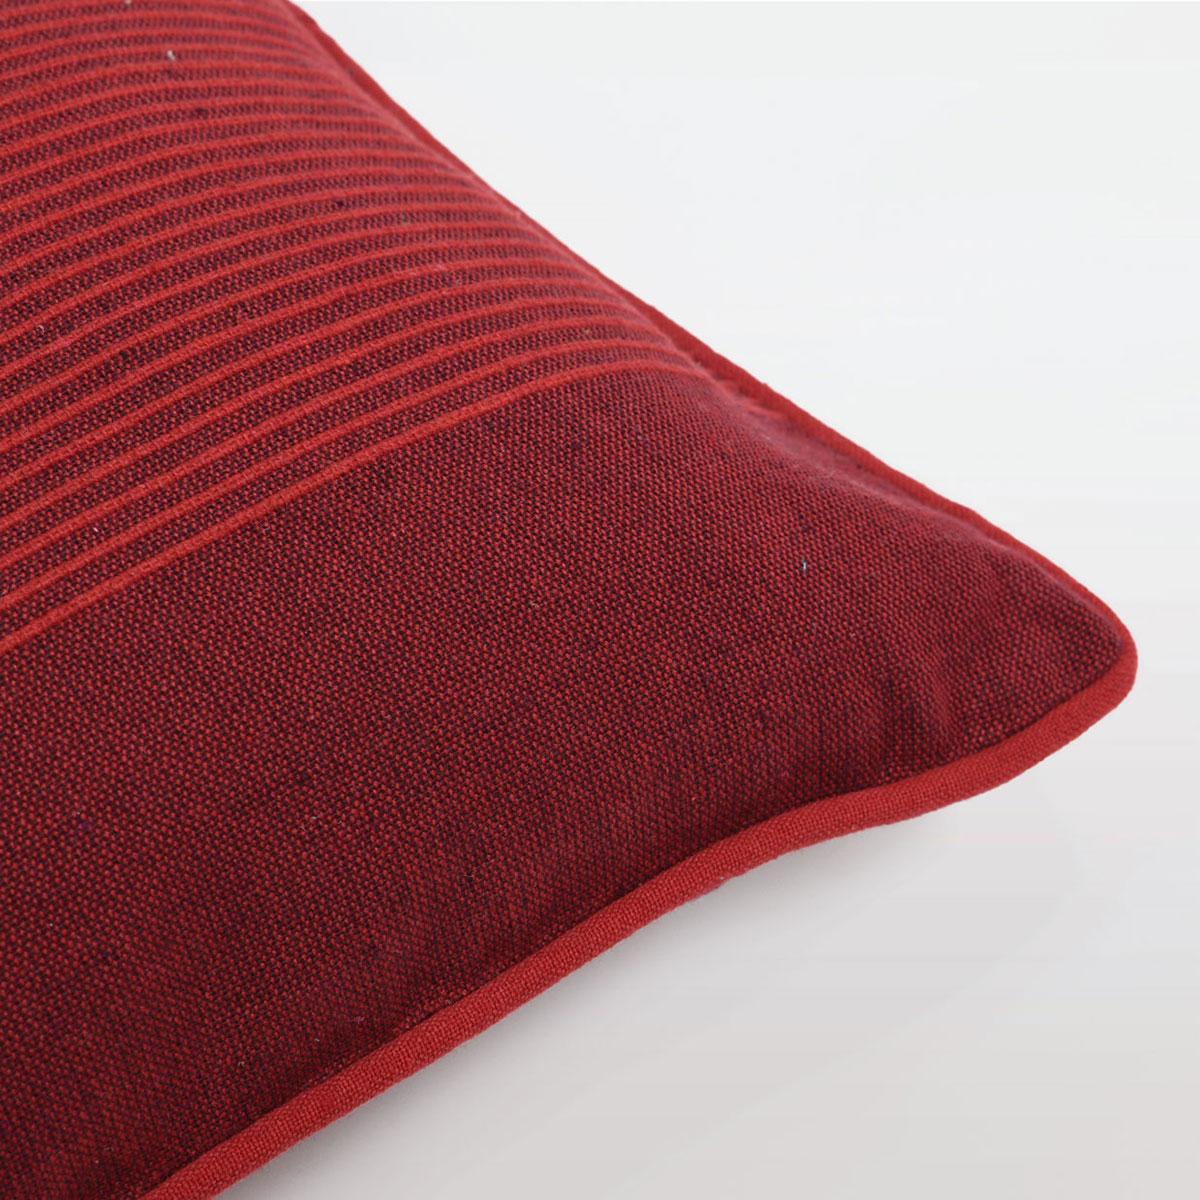 Jastučnica Blend